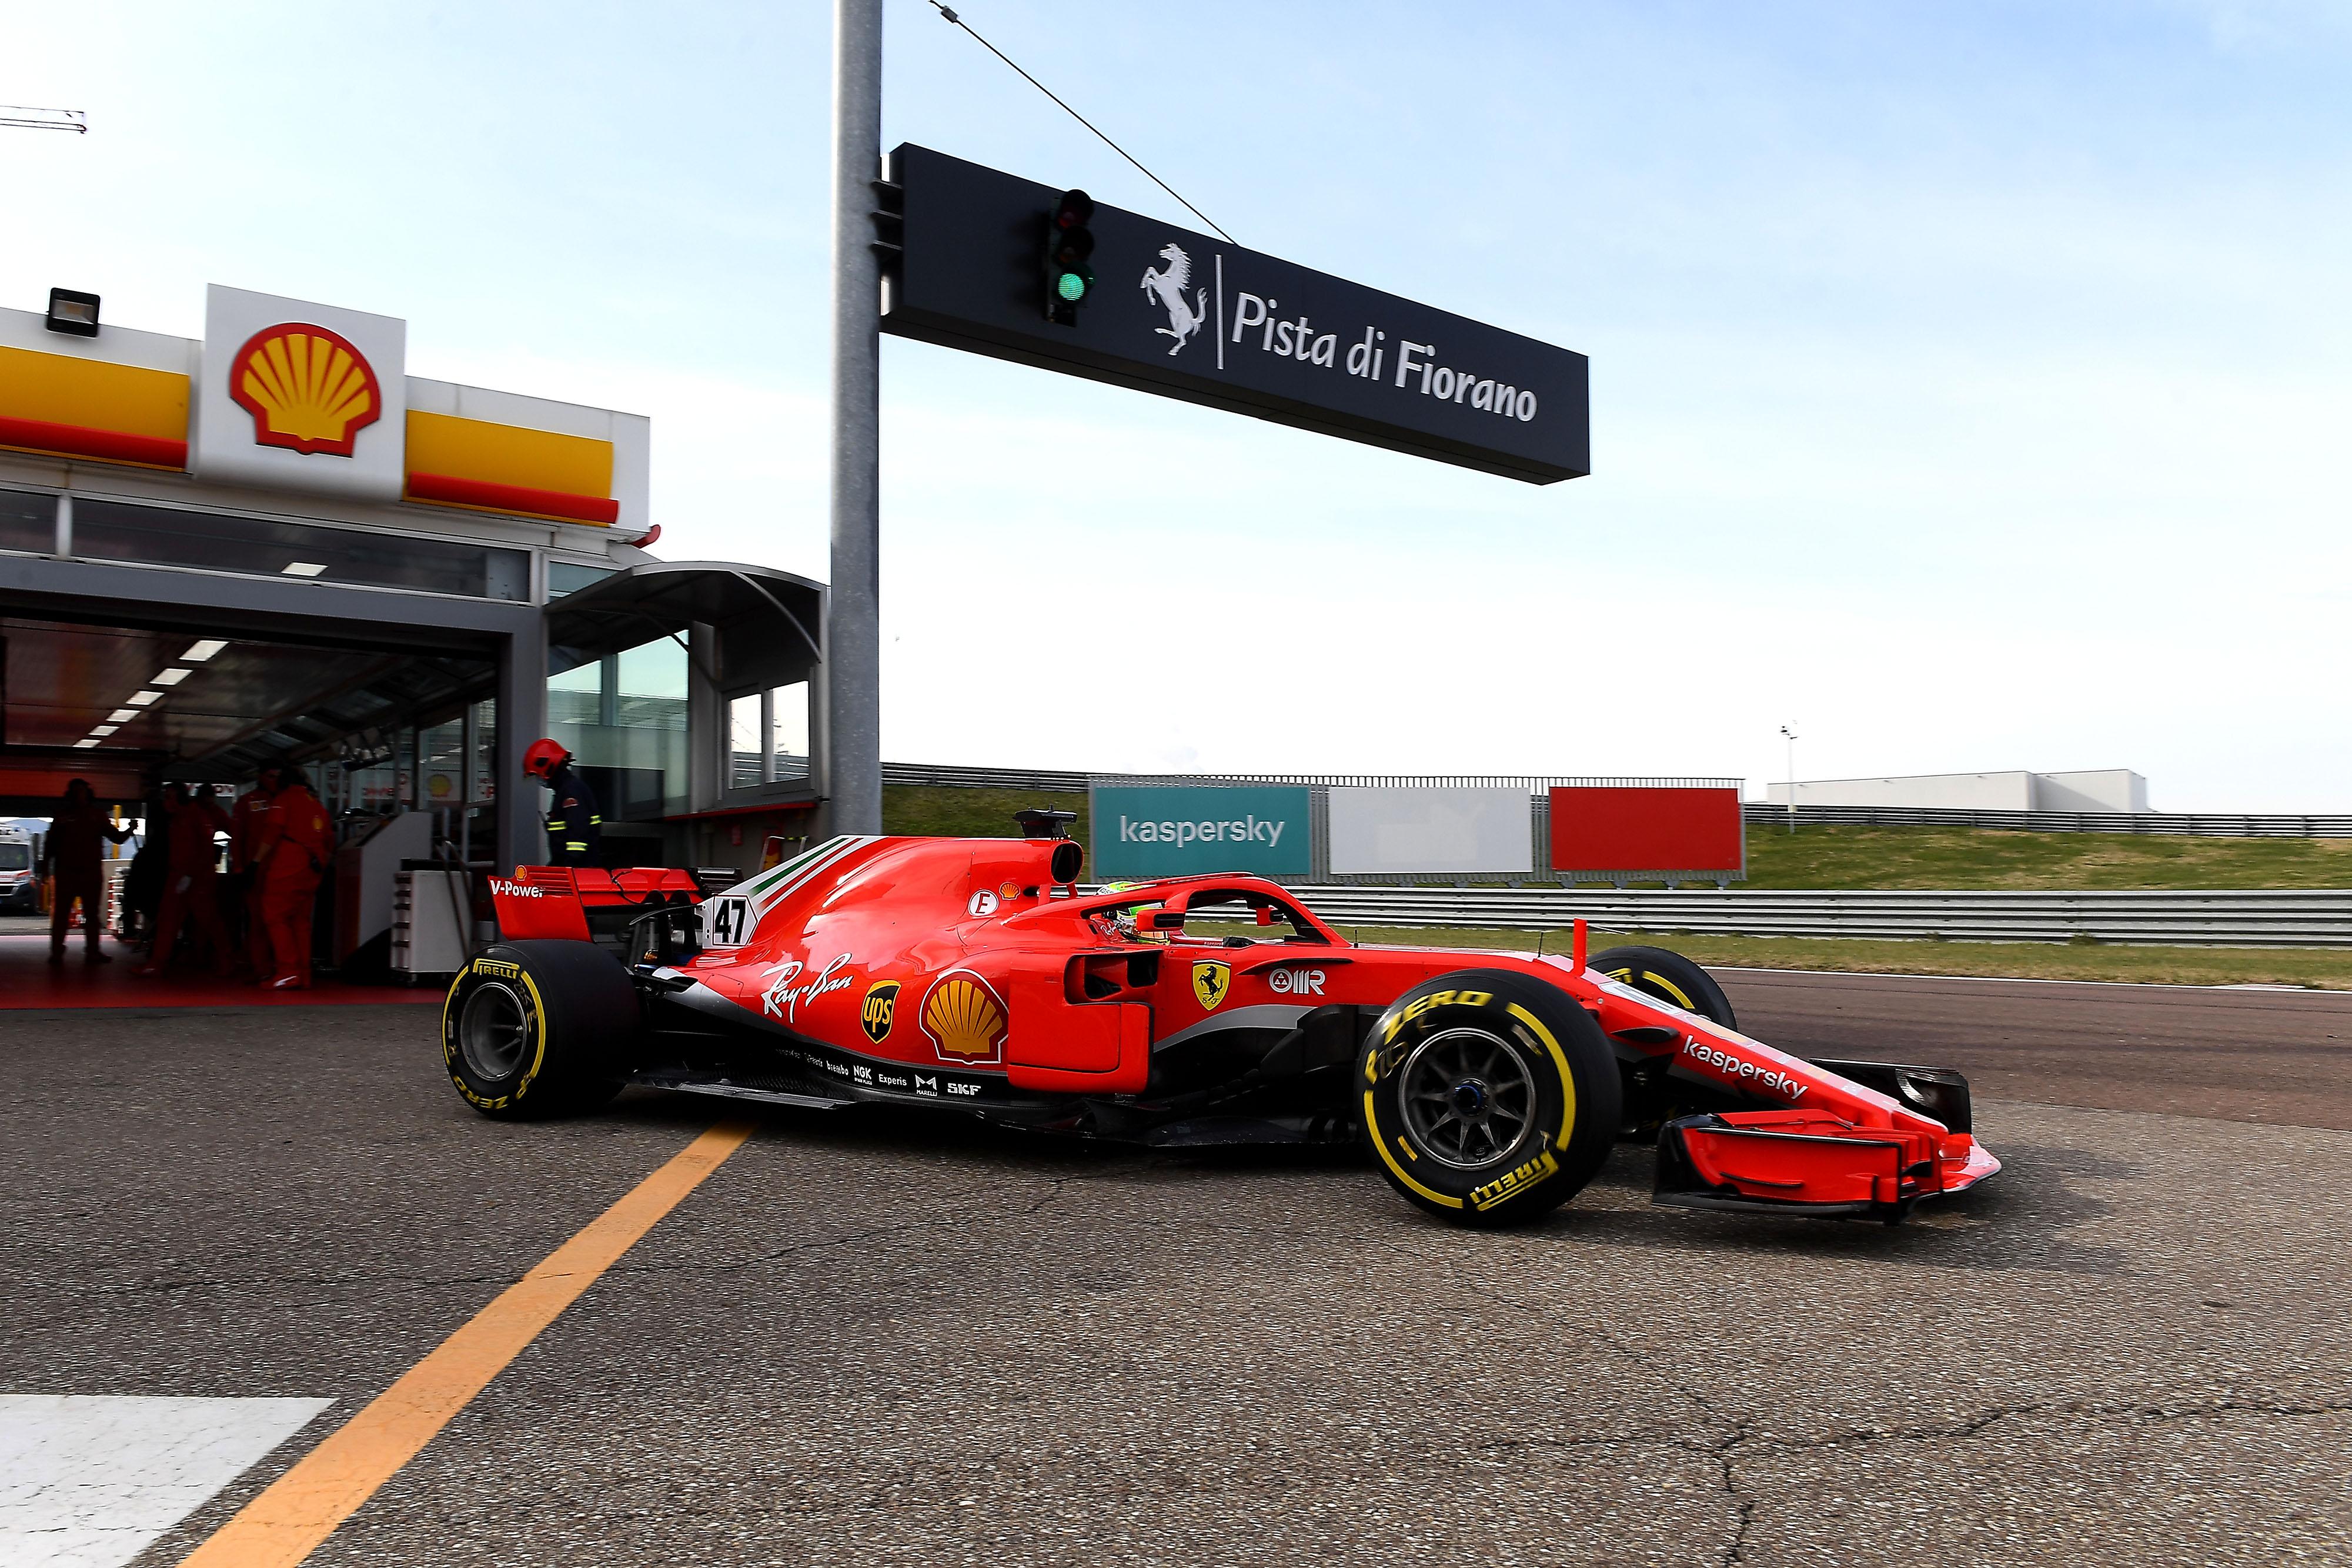 Fotó:Colombo / Scuderia Ferrari Press Office<br /><br />